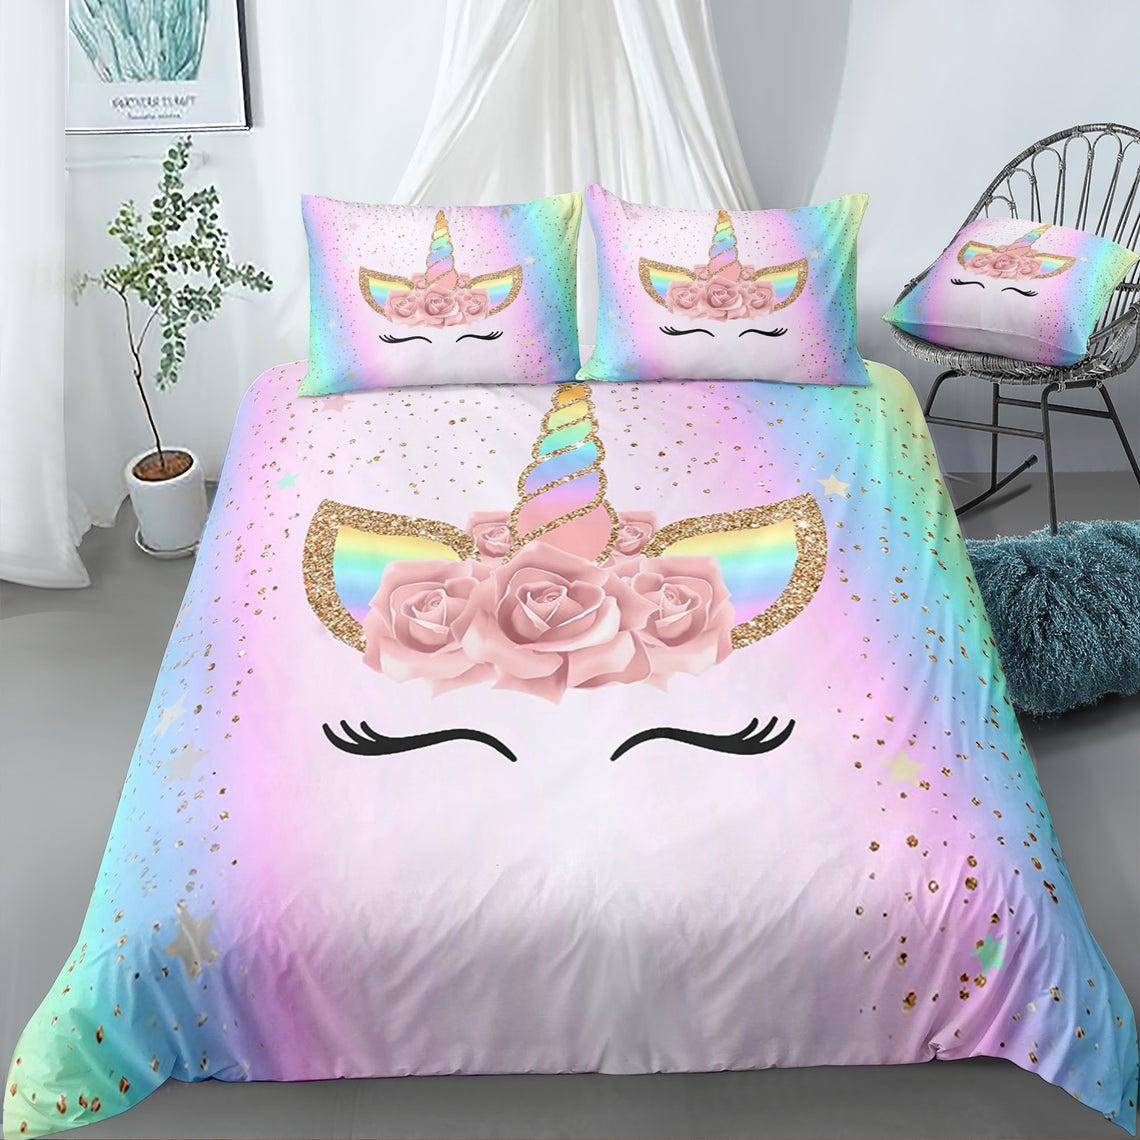 lovely unicorn floral bedding set 1